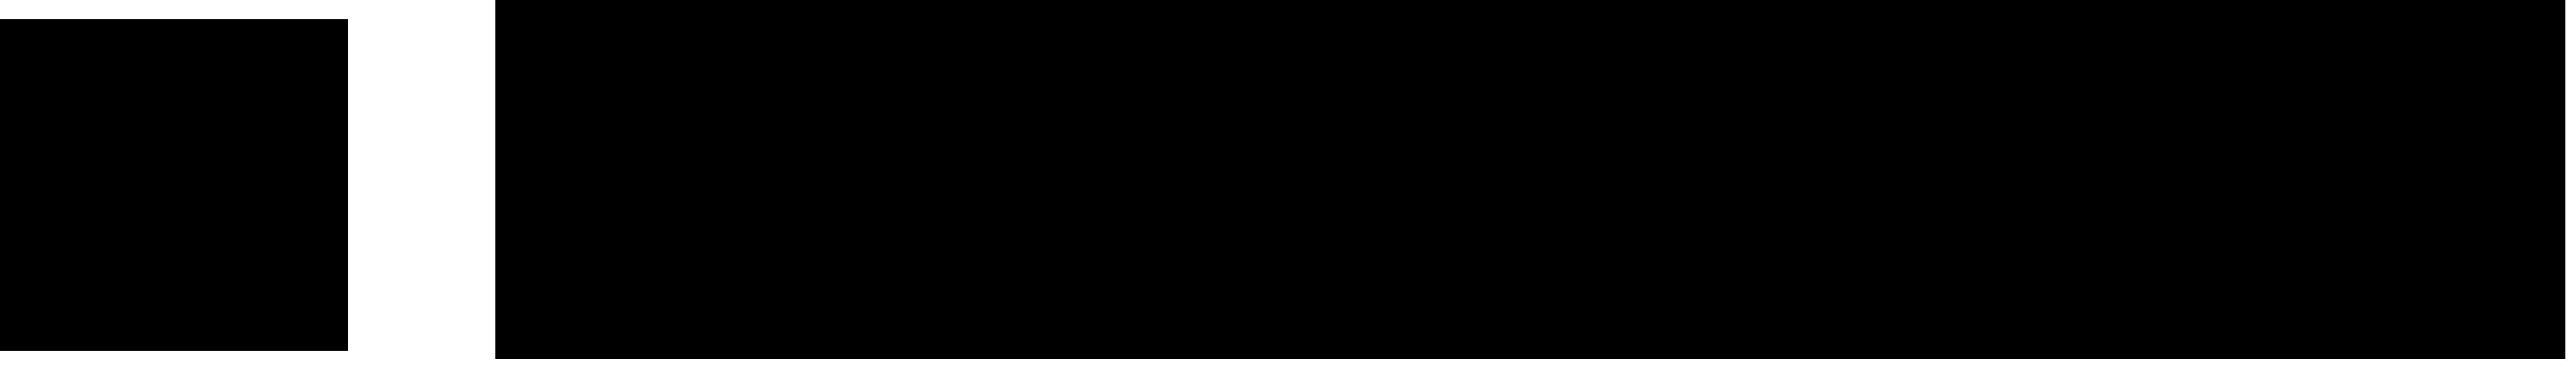 hublot logos download manchester united logo font manchester united logo badge